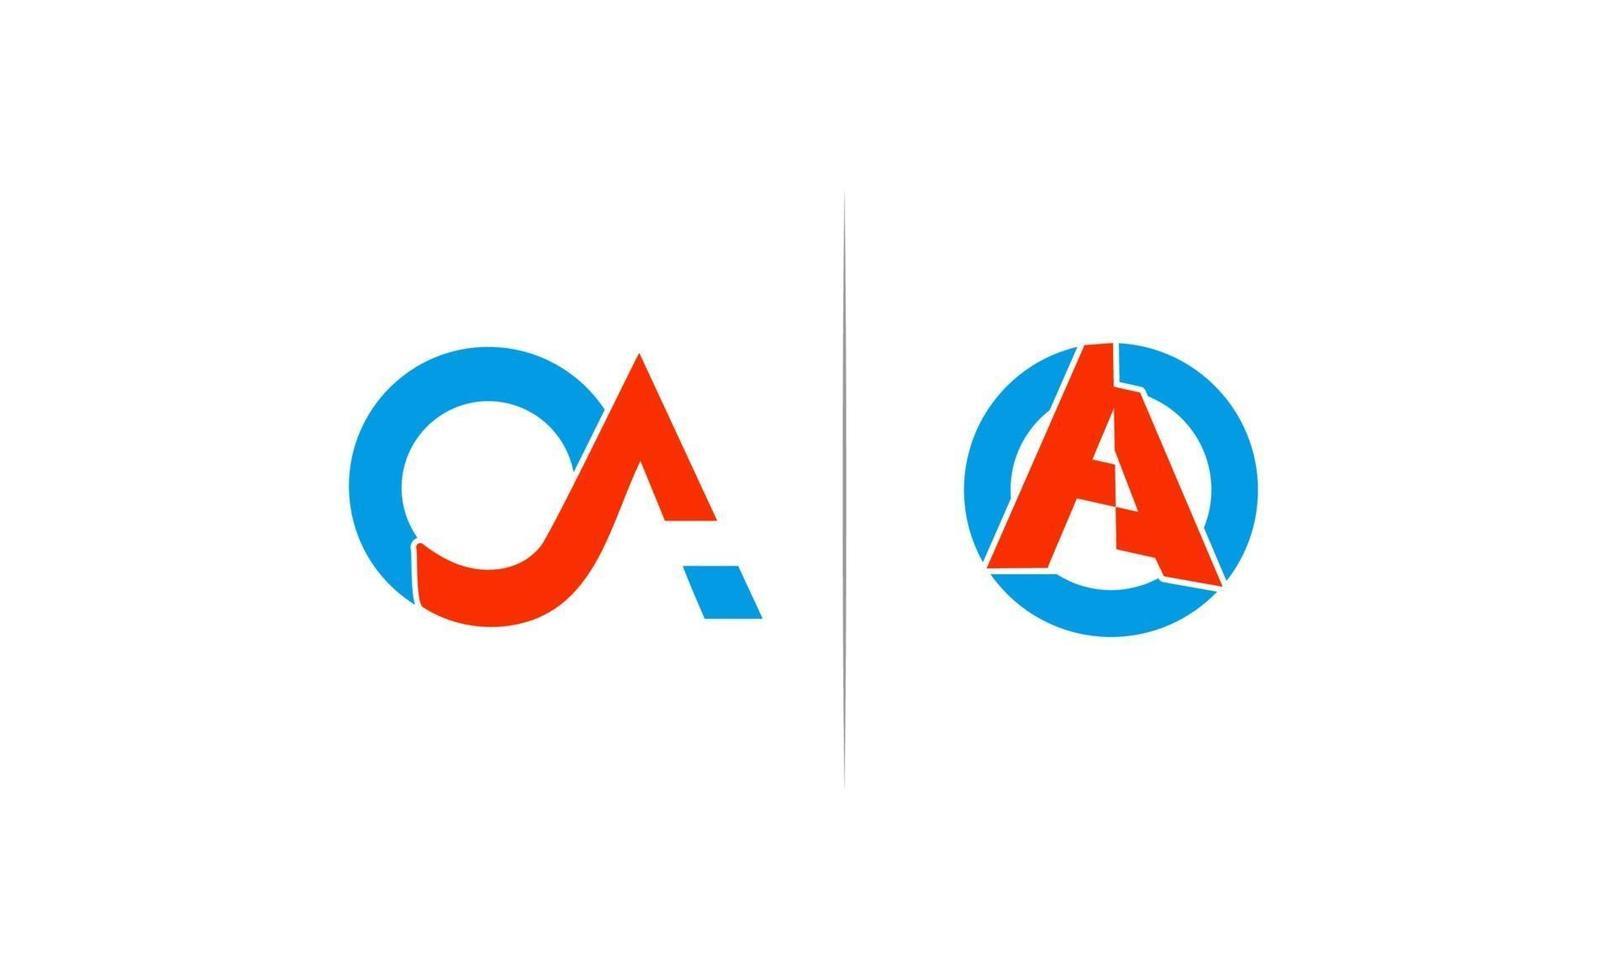 initial oa, o, en kreativ logotyp mall design vektor